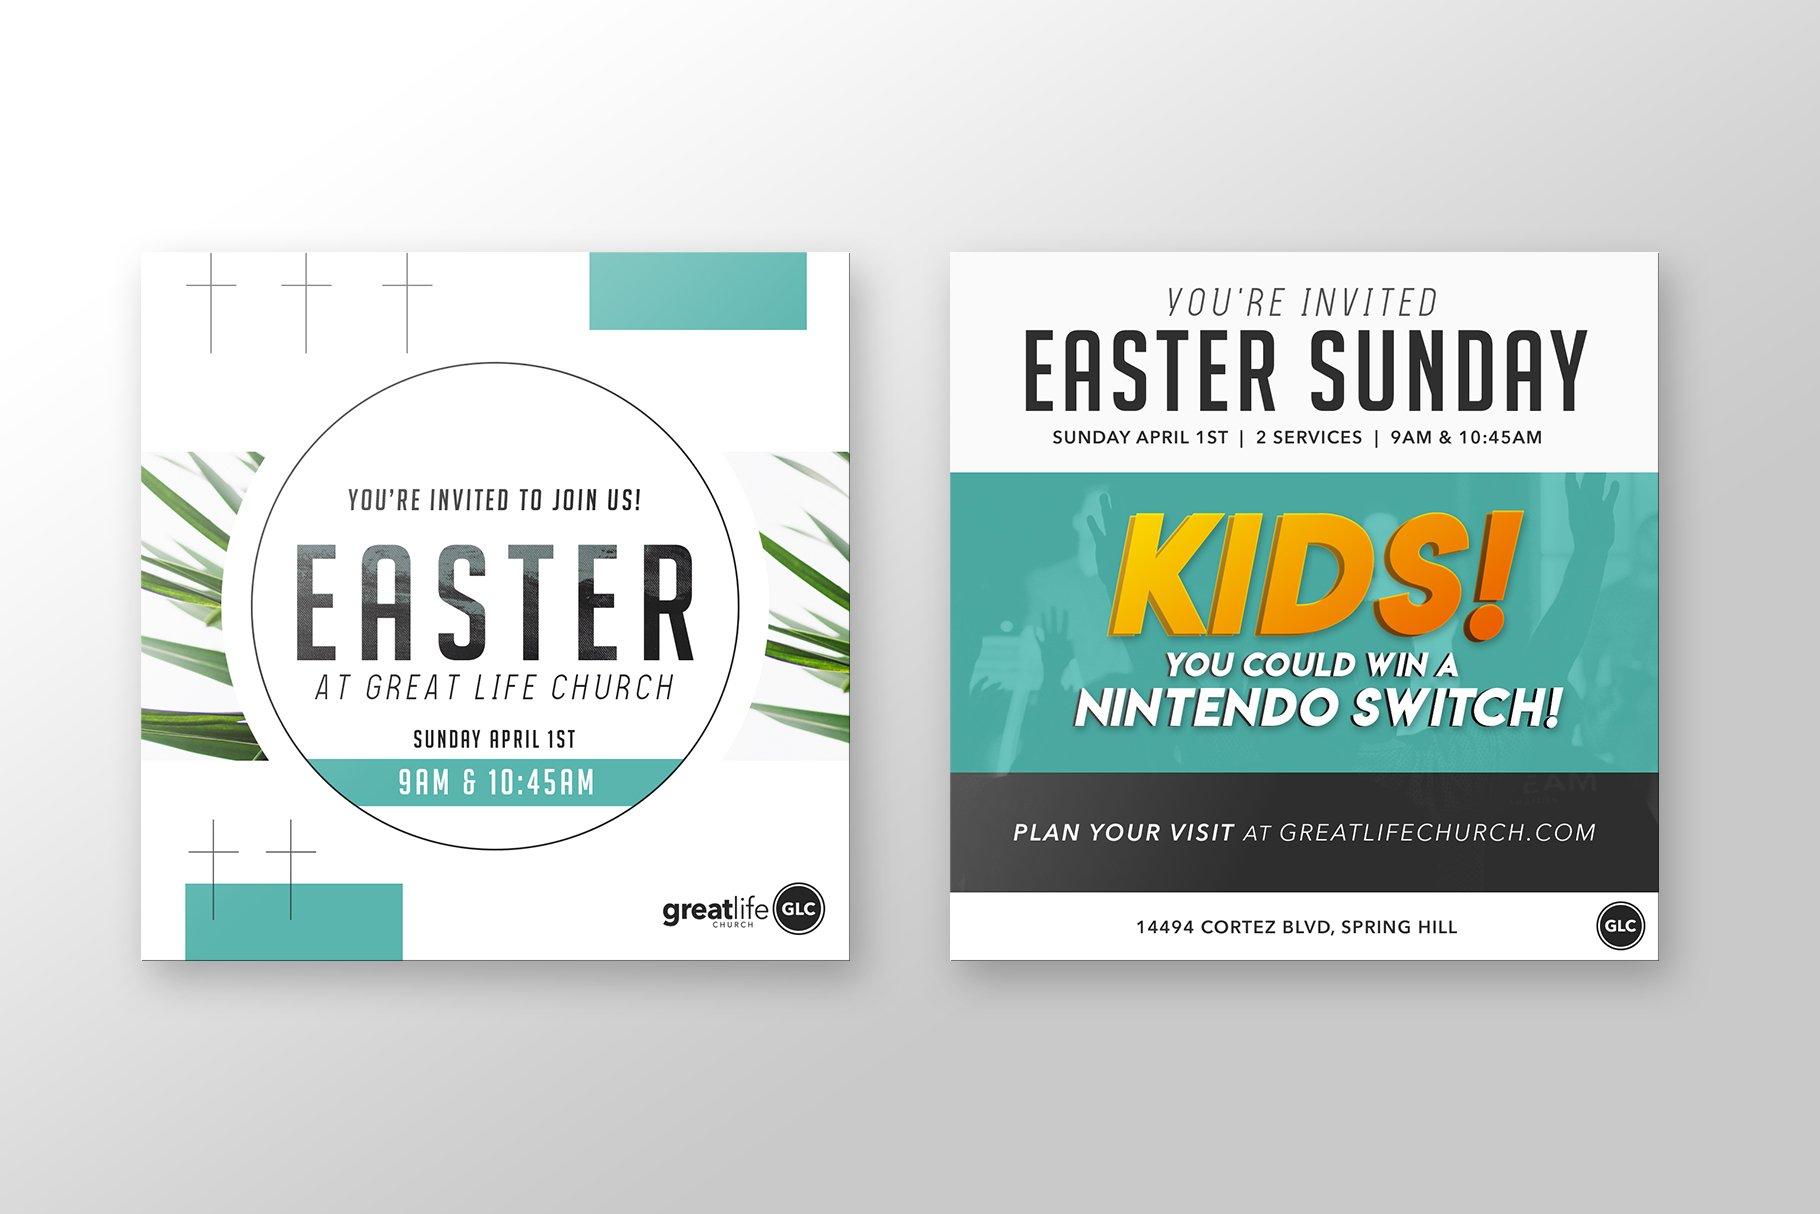 Easter Church Invitation Regarding Church Invite Cards Template